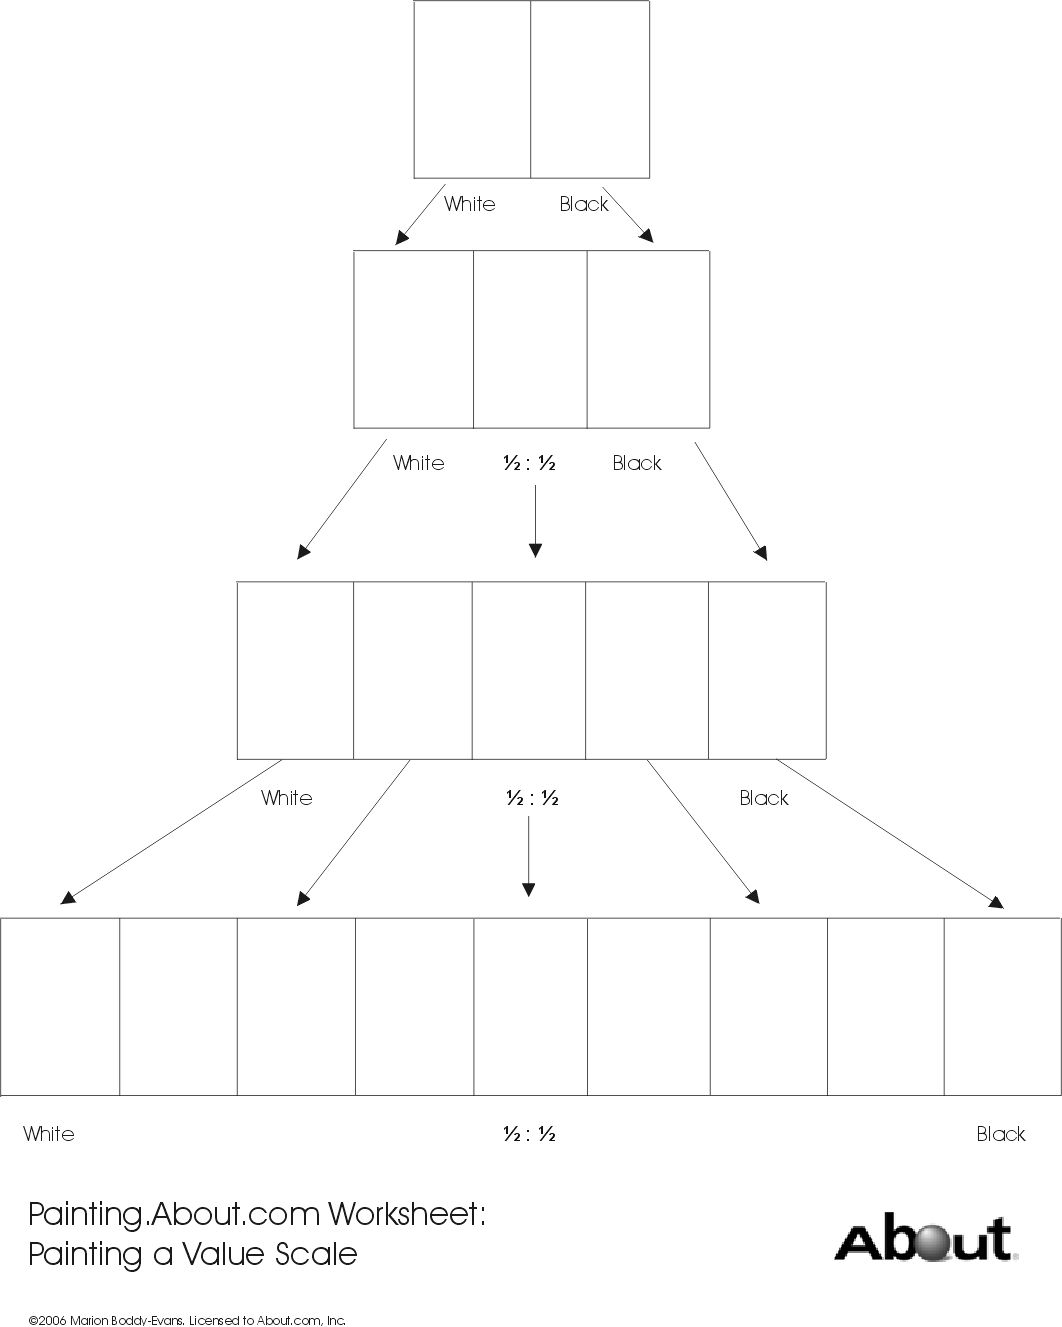 Worksheets Value Scale Worksheet free printable art worksheets